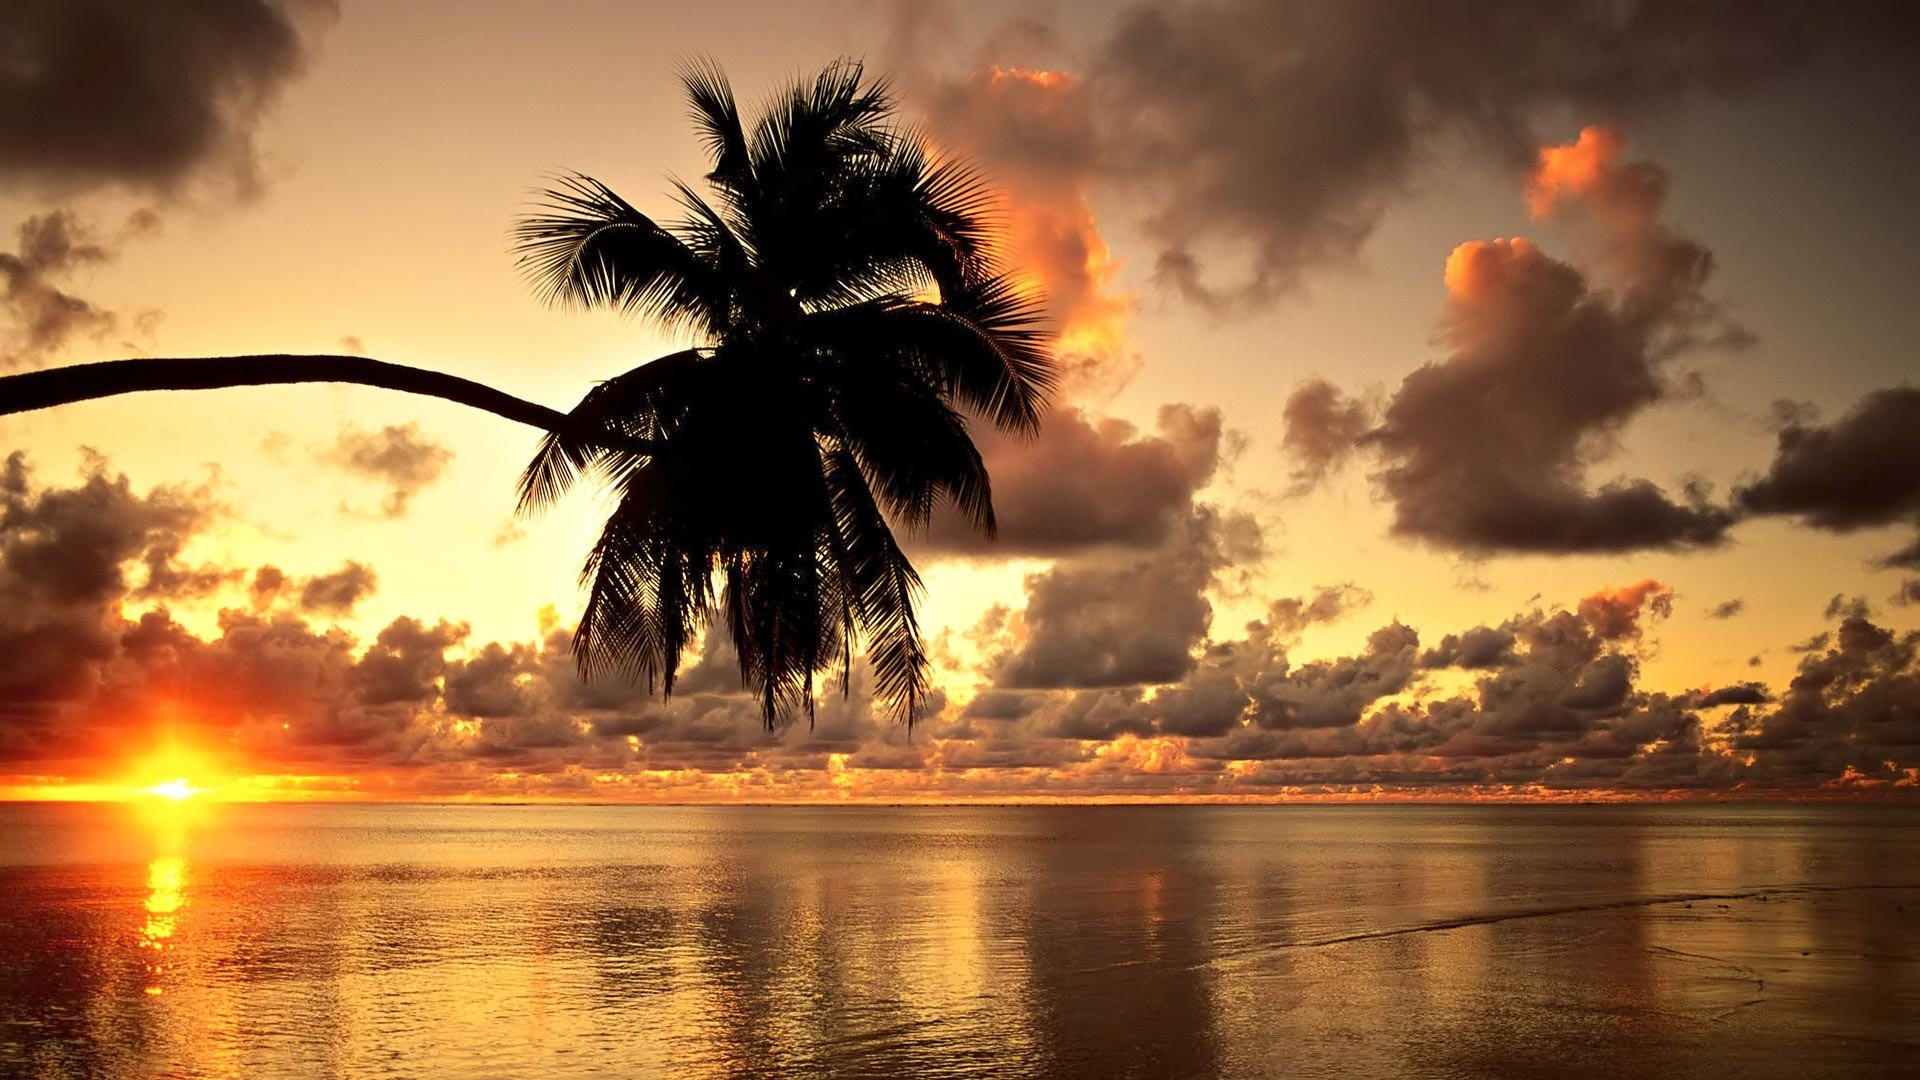 Hawaii Beach Sunset Landscape Clouds Nature 1920x1080